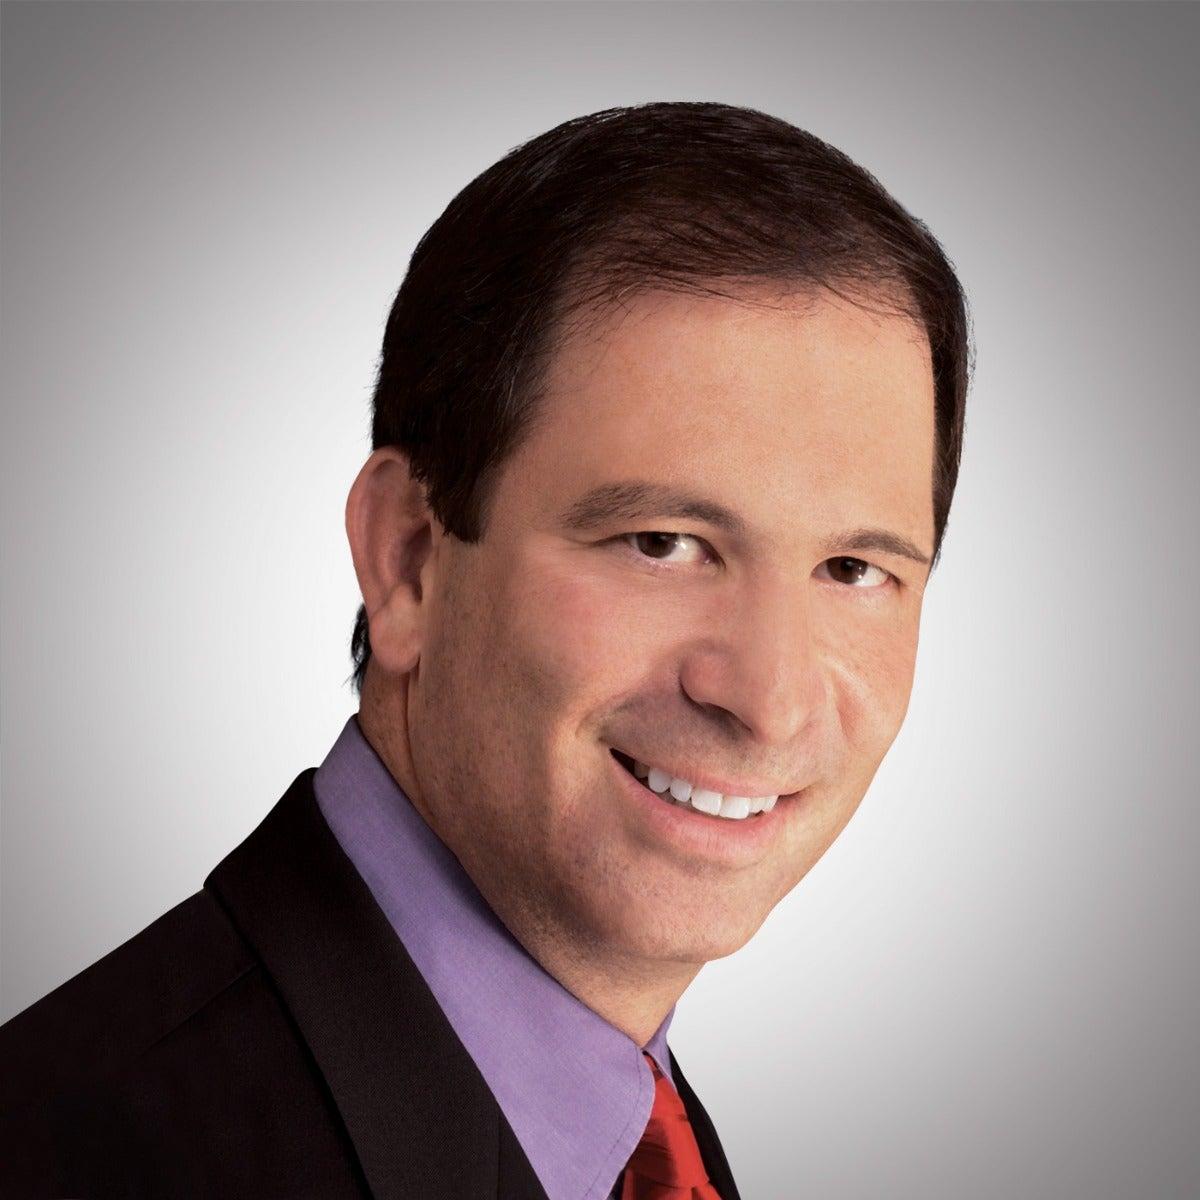 Dental Education Instructor - Michael A. Schneider, DMD